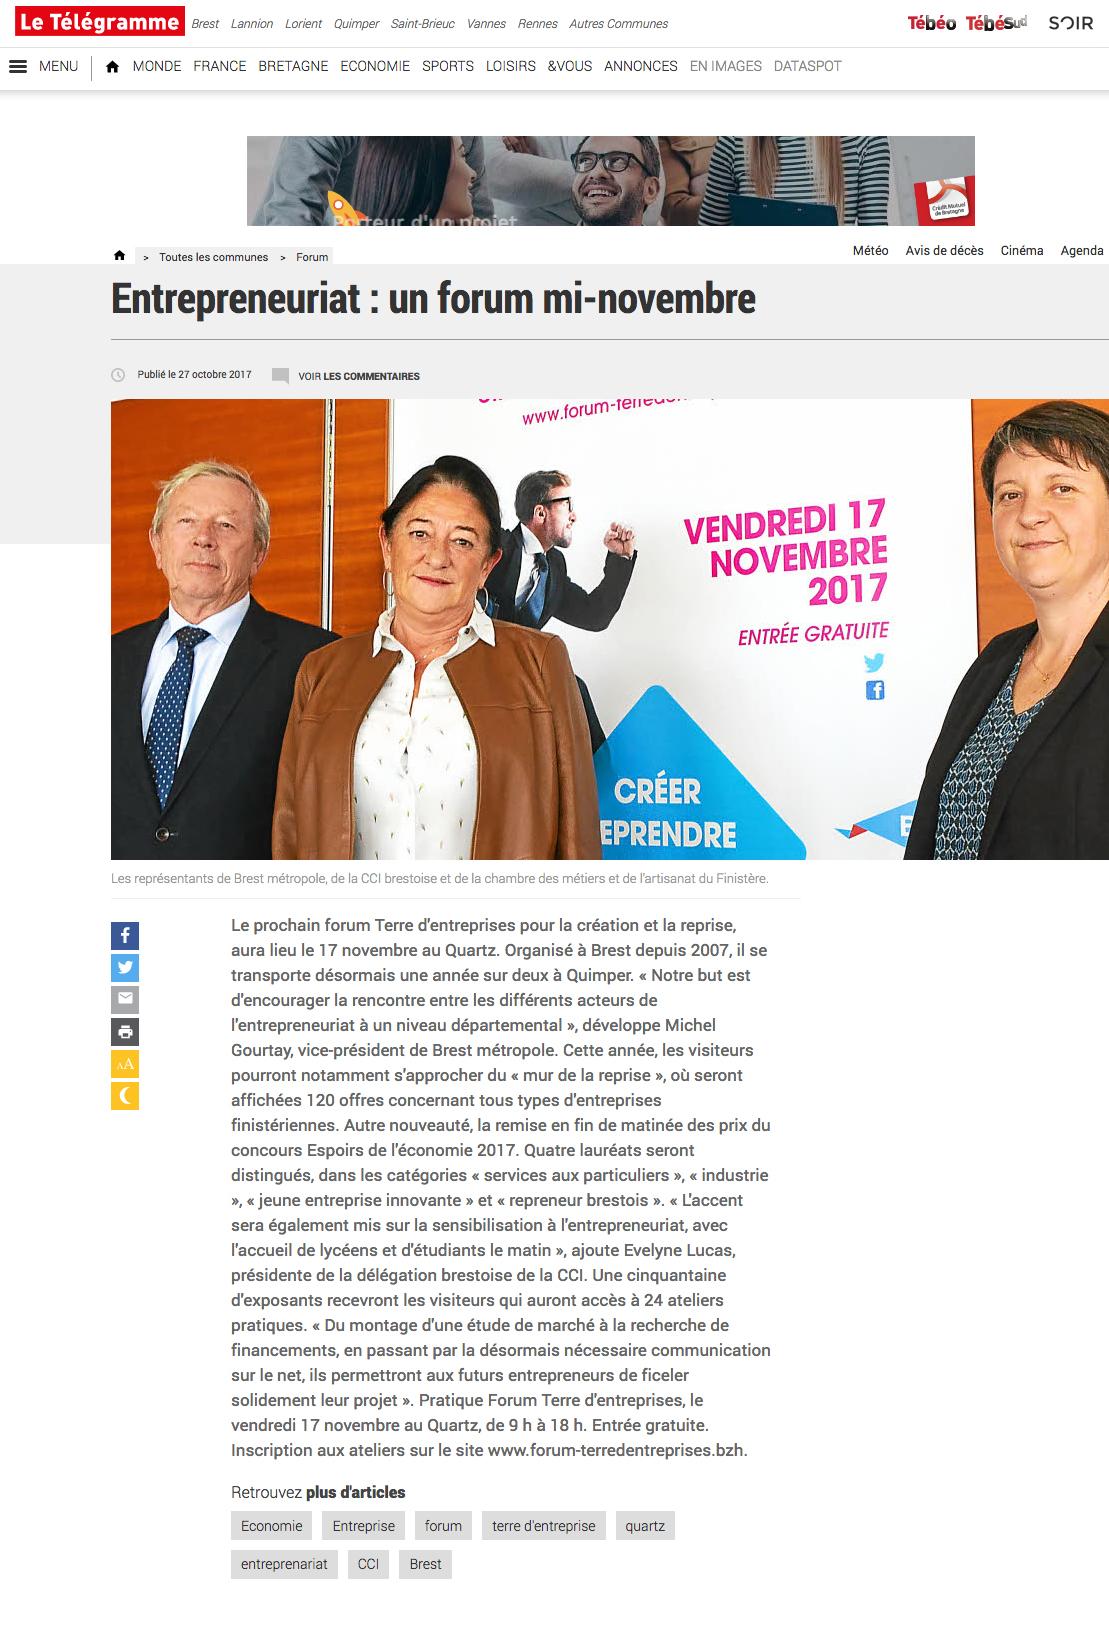 www.letelegramme.fr_2017-10-30_11-23-09